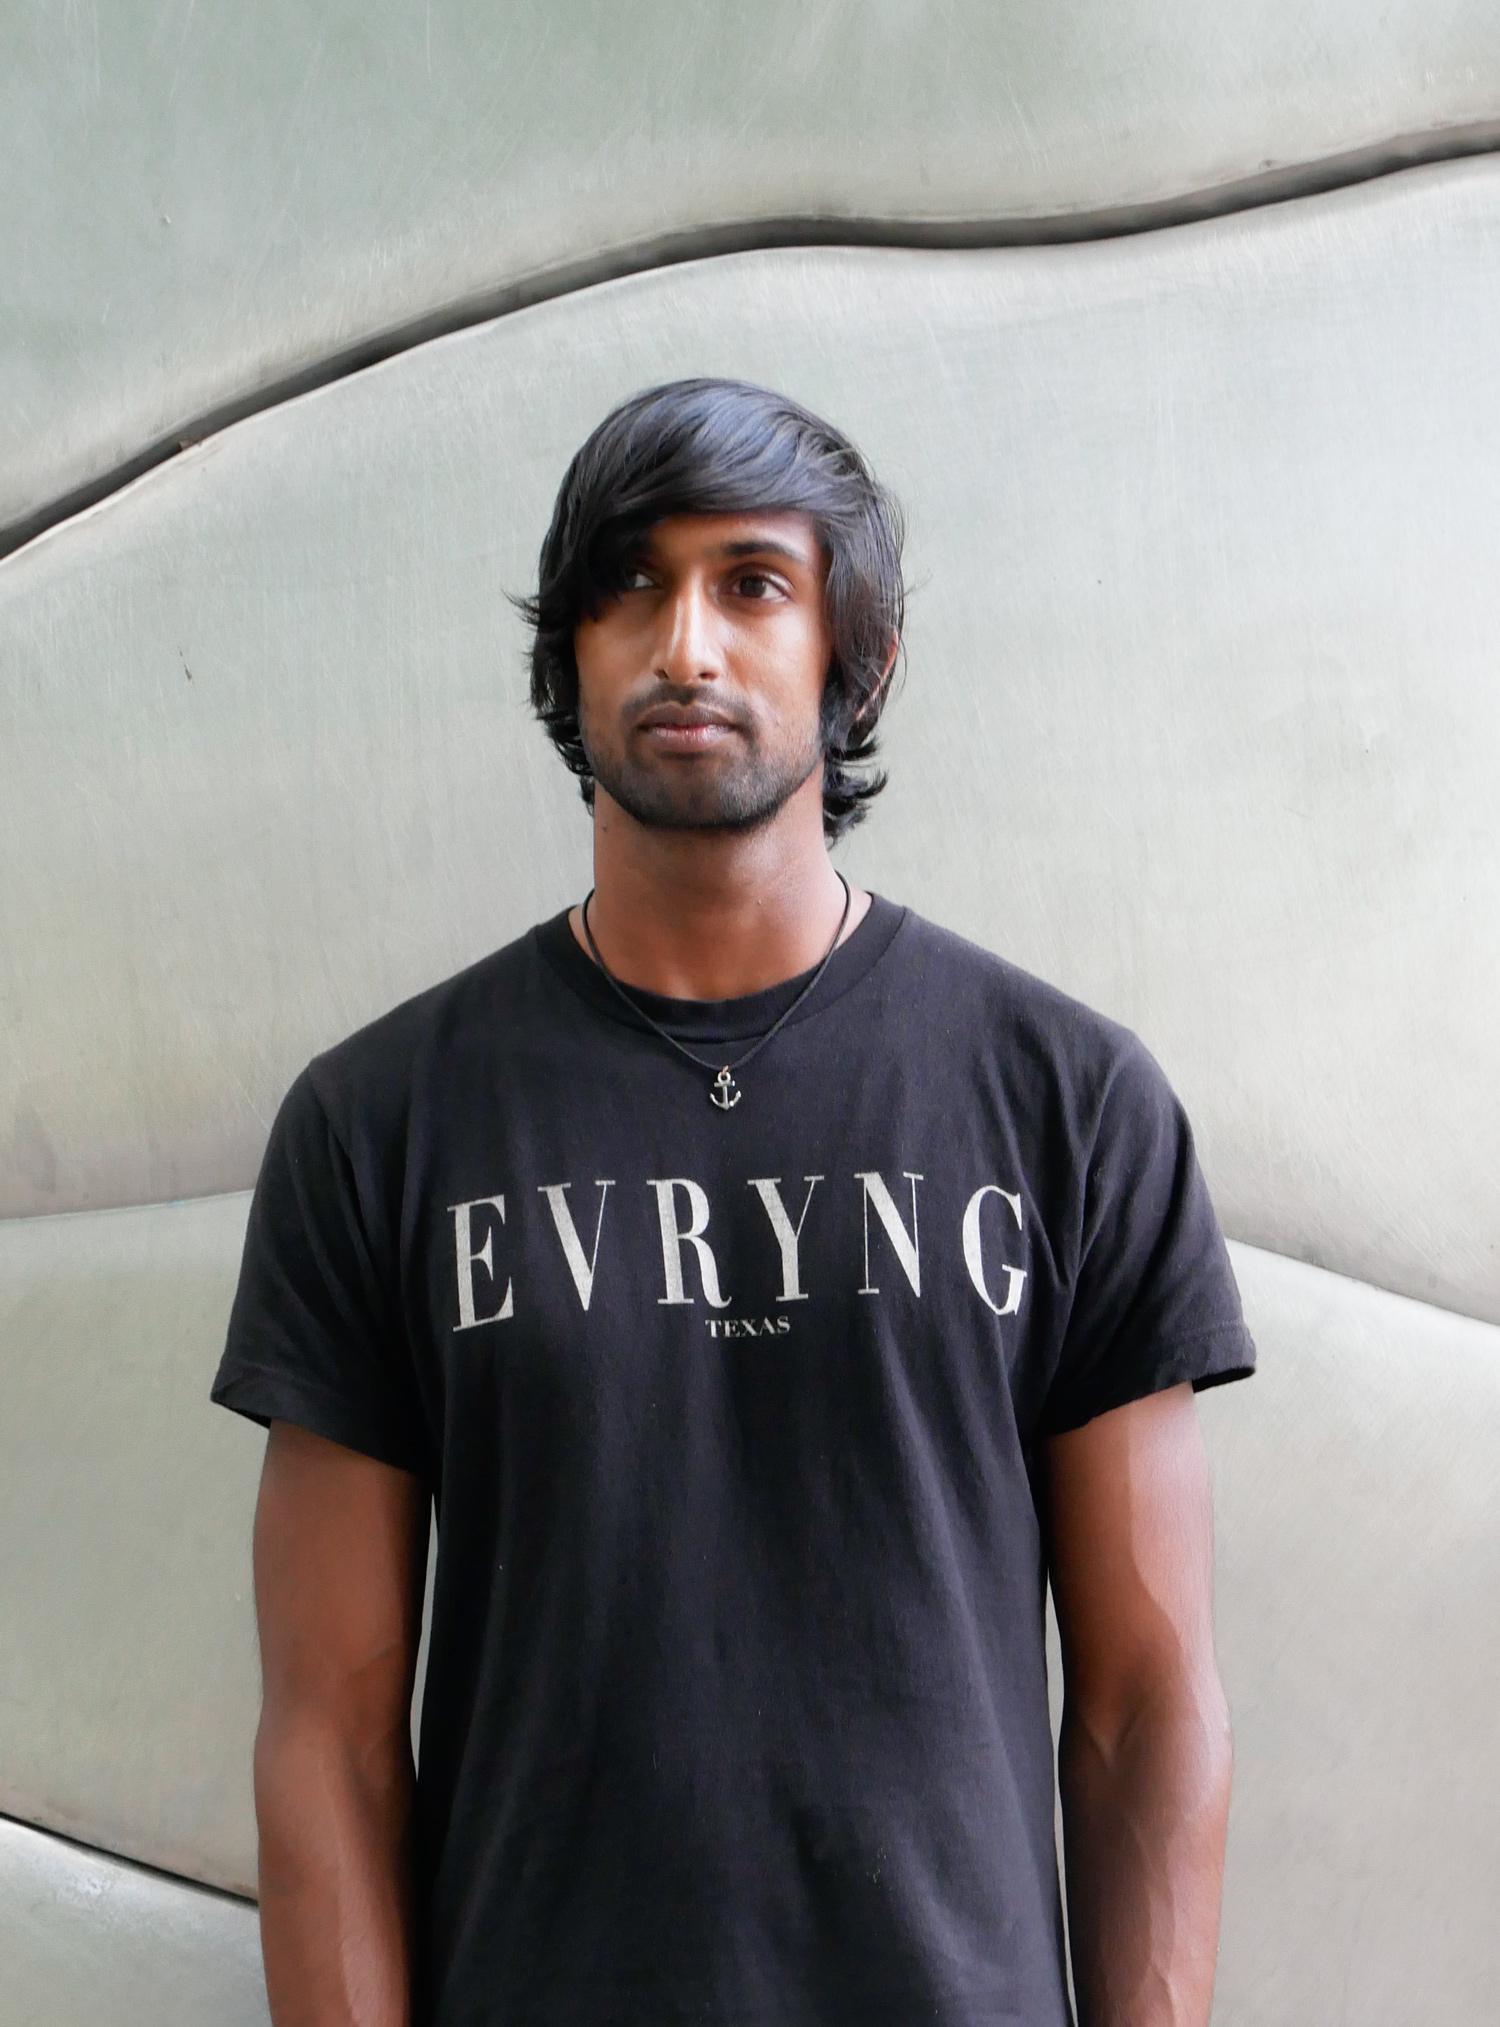 Evryng-Free-Shirts.jpg